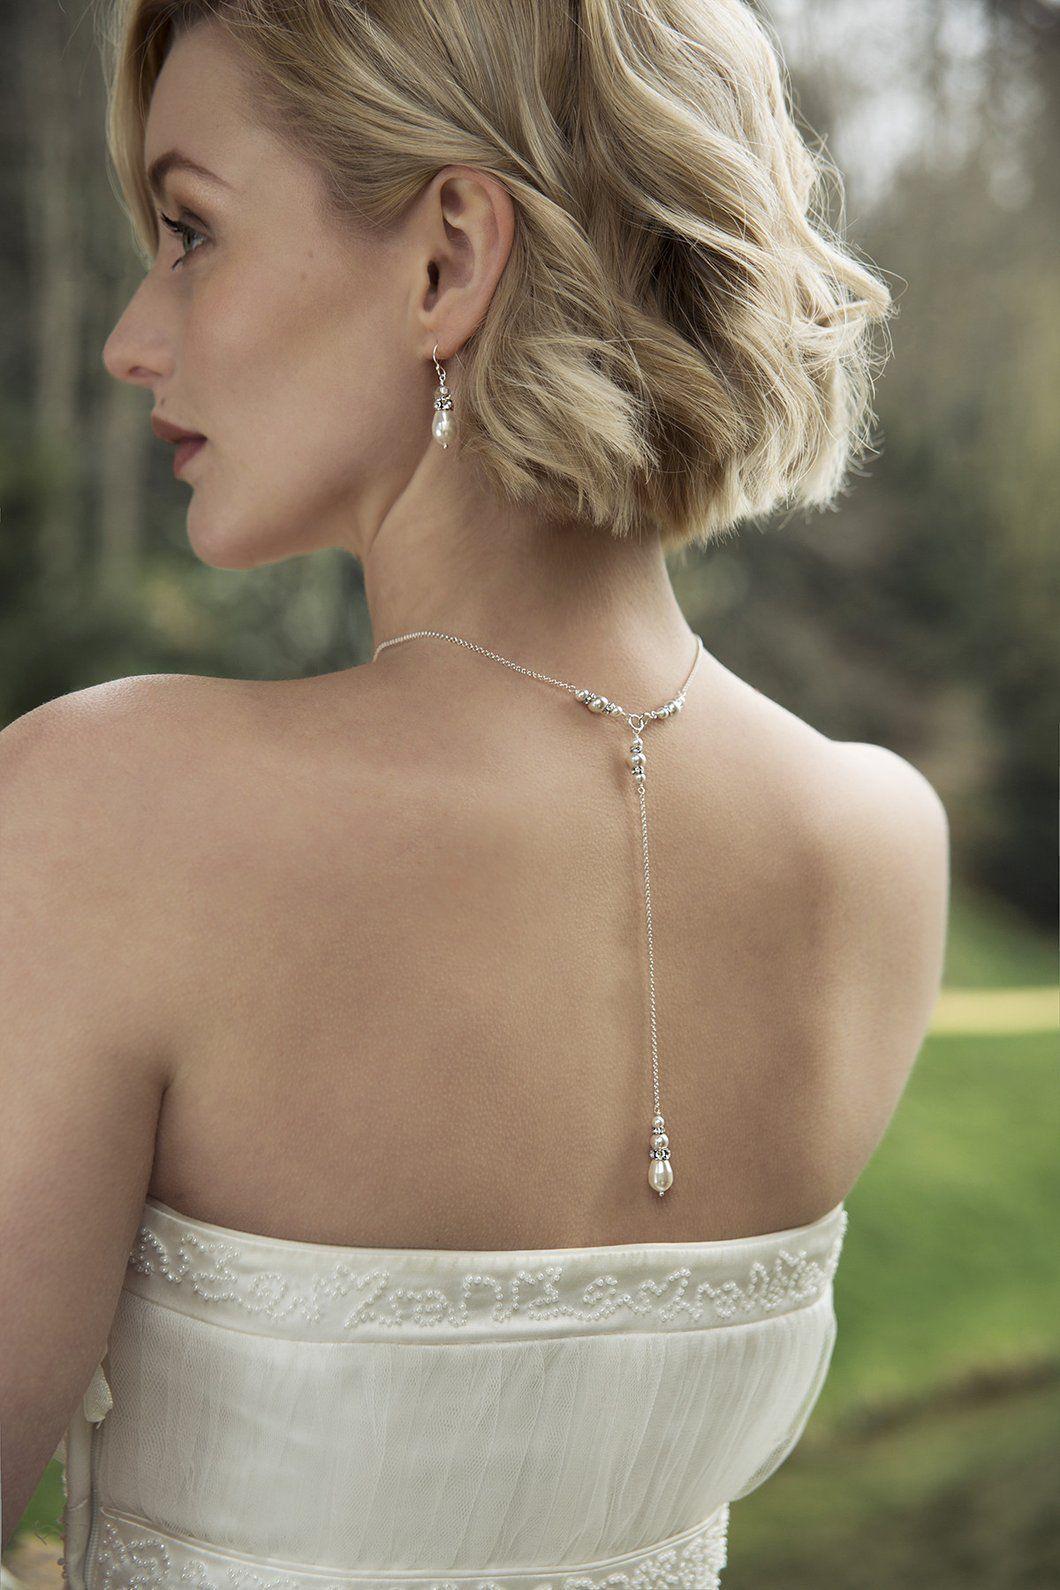 Short wedding hair long backdrop bridal necklace elegant modern